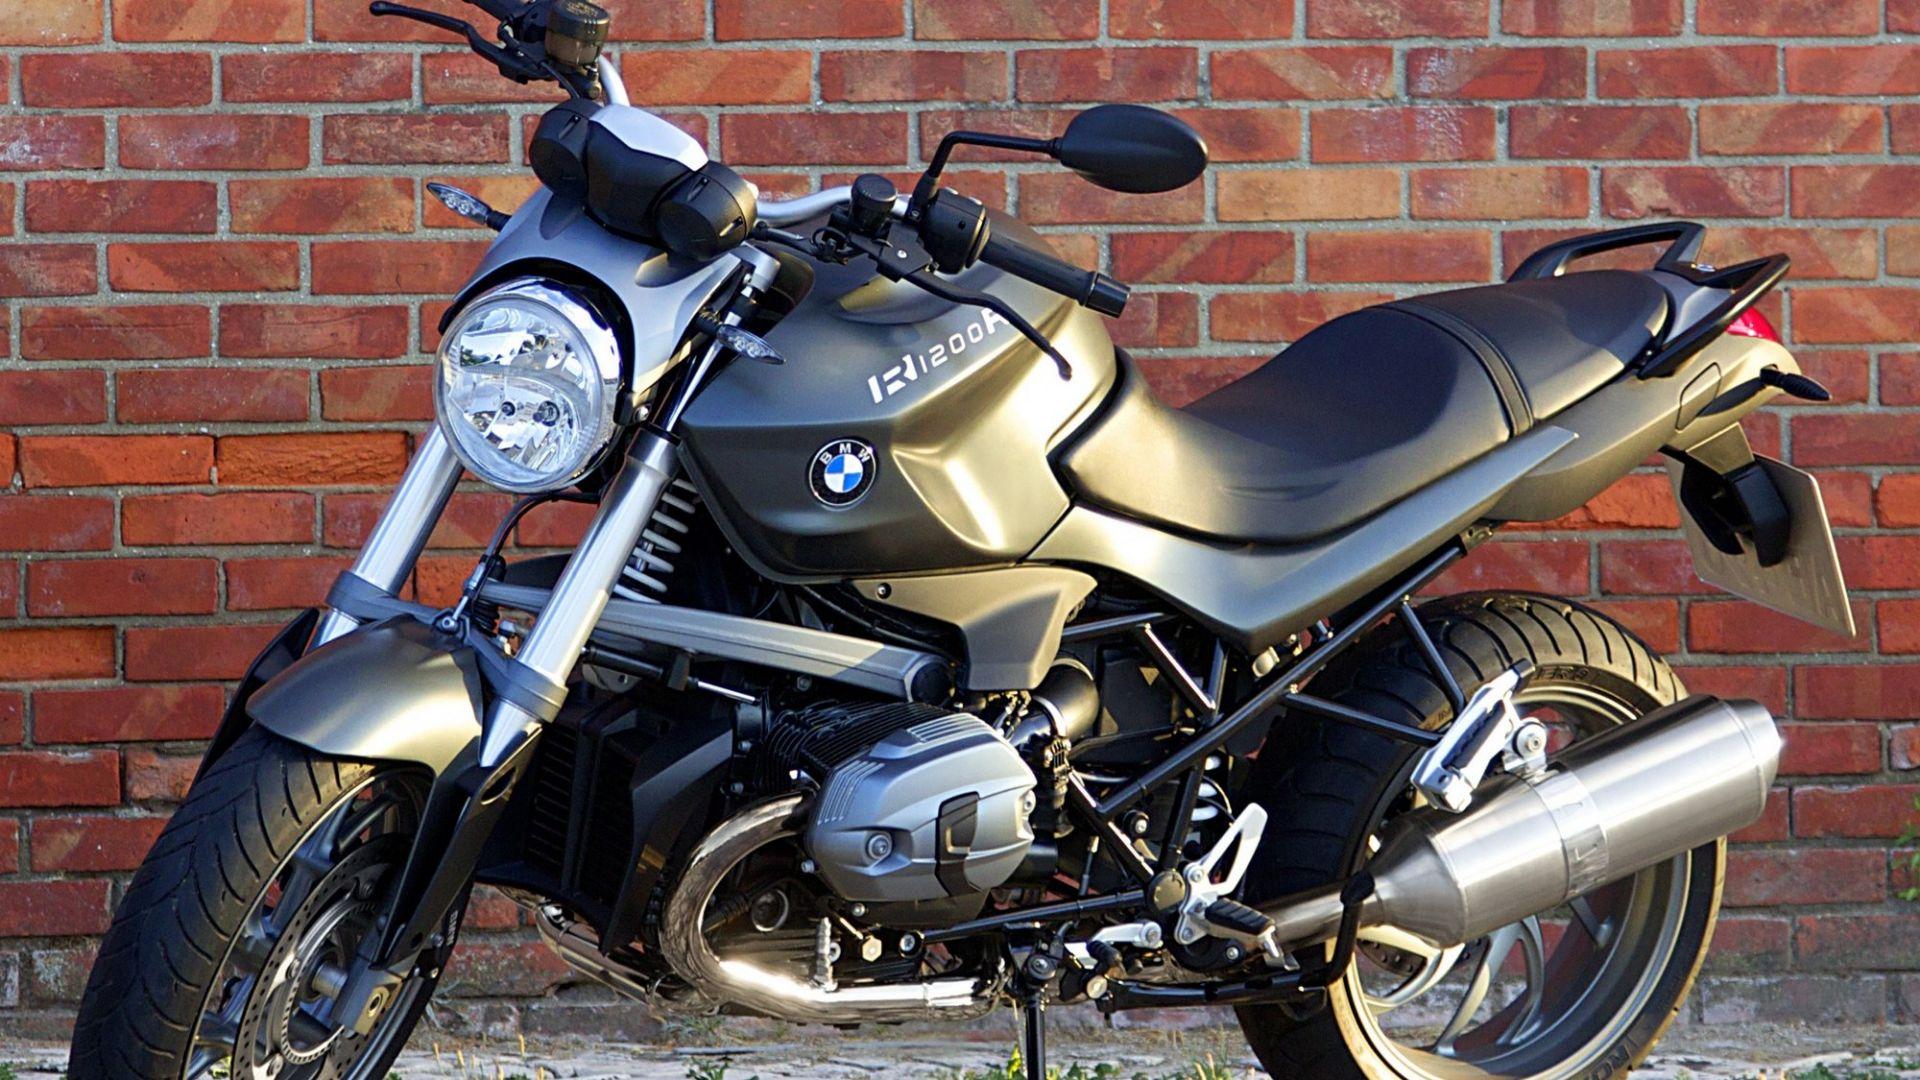 Anteprima Bmw R1200r 2011 Motorbox